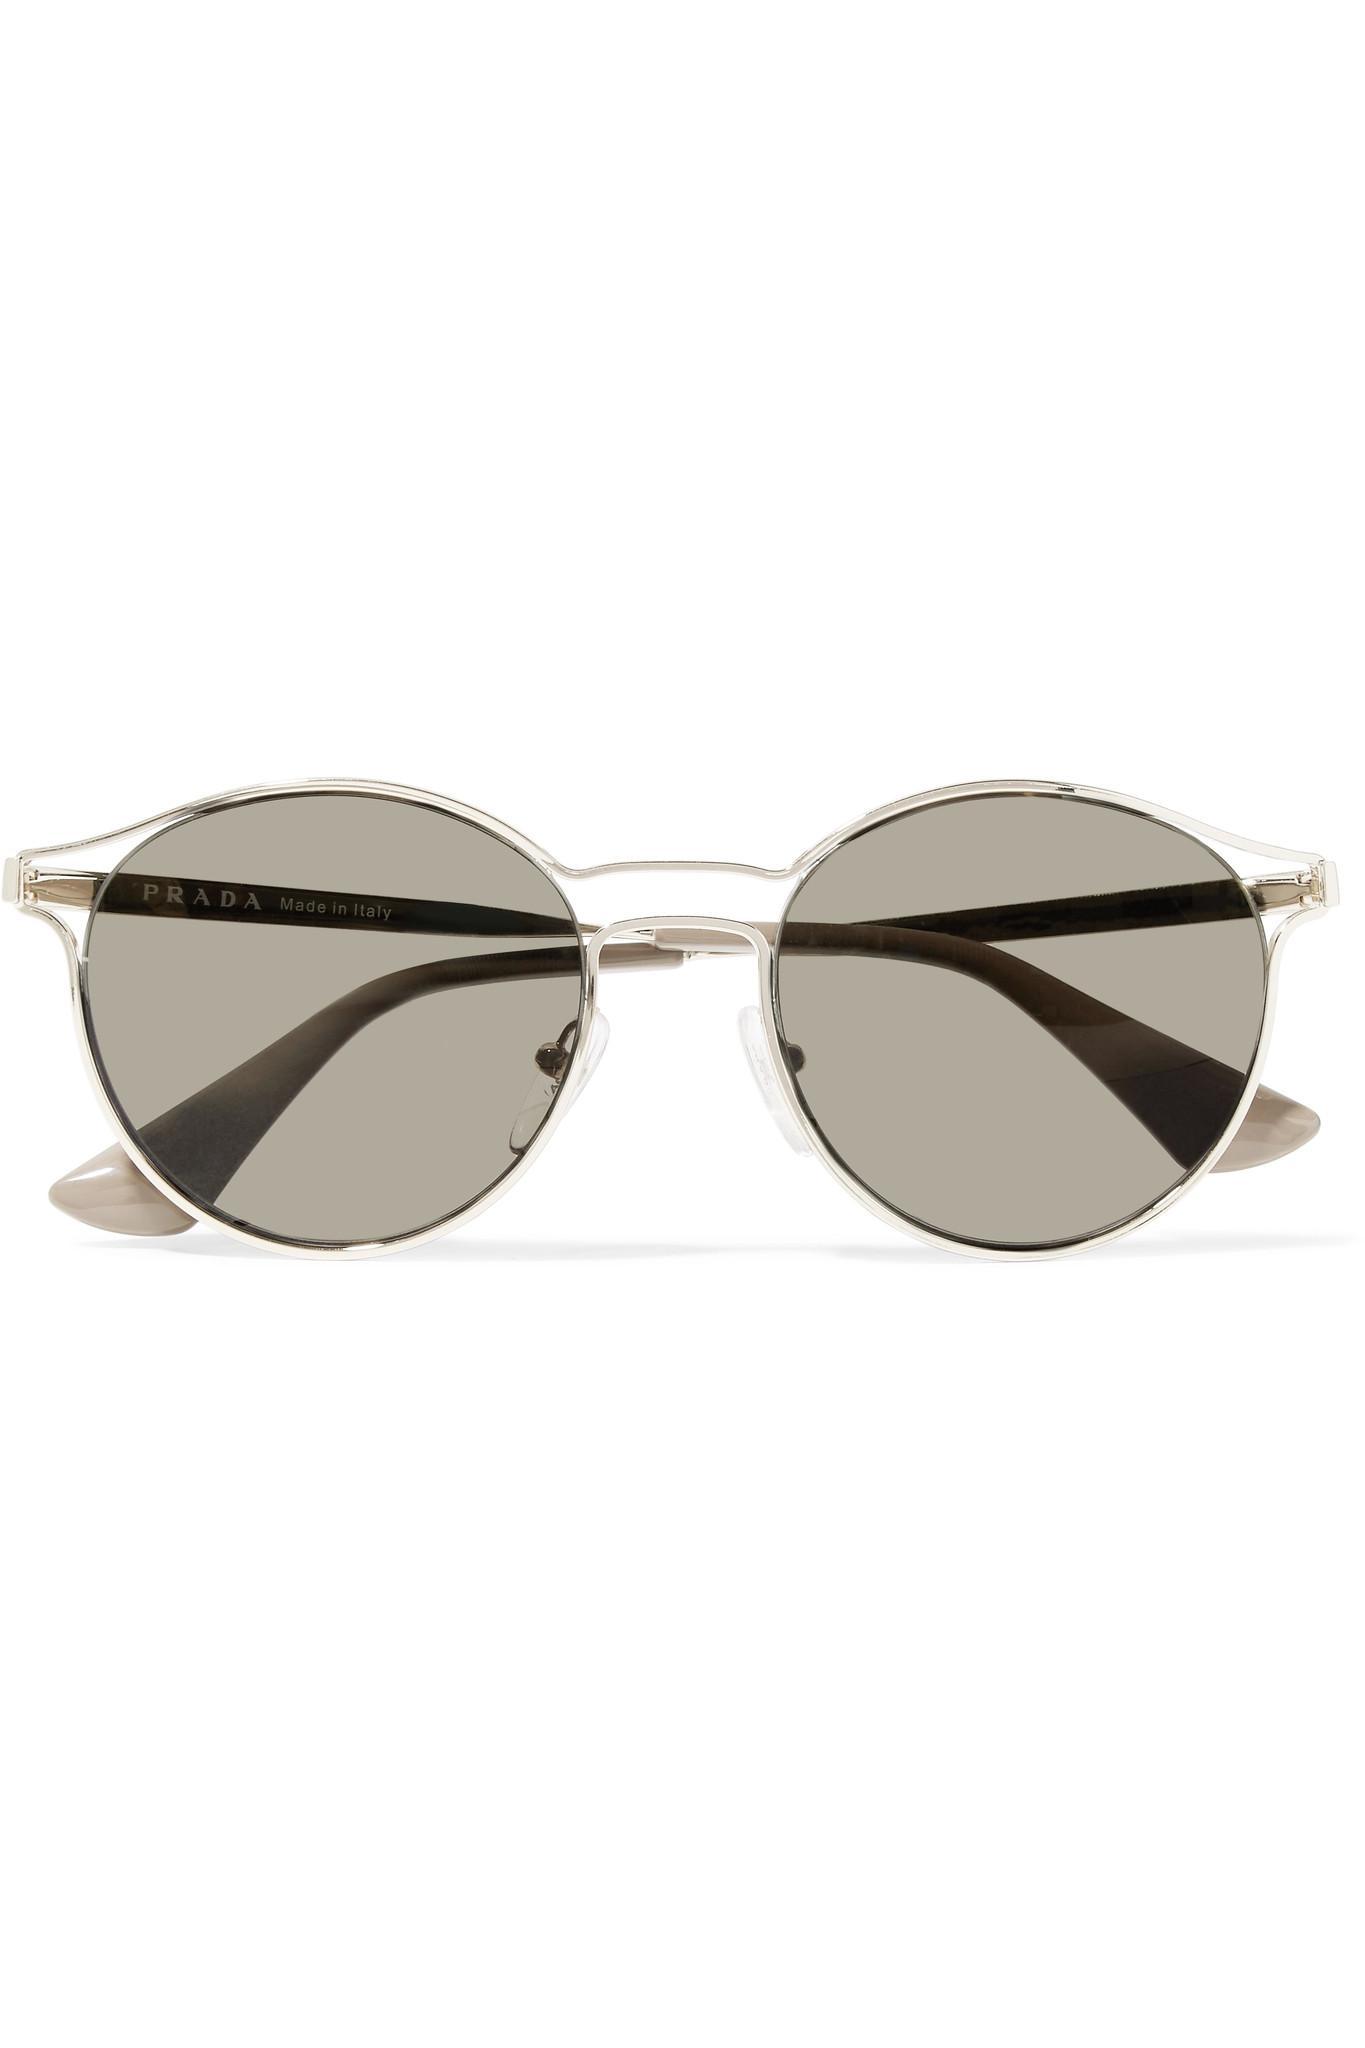 4be90ccc0ac5f ... canada prada round frame gold tone mirrored sunglasses in metallic lyst  51d3f 4dba5